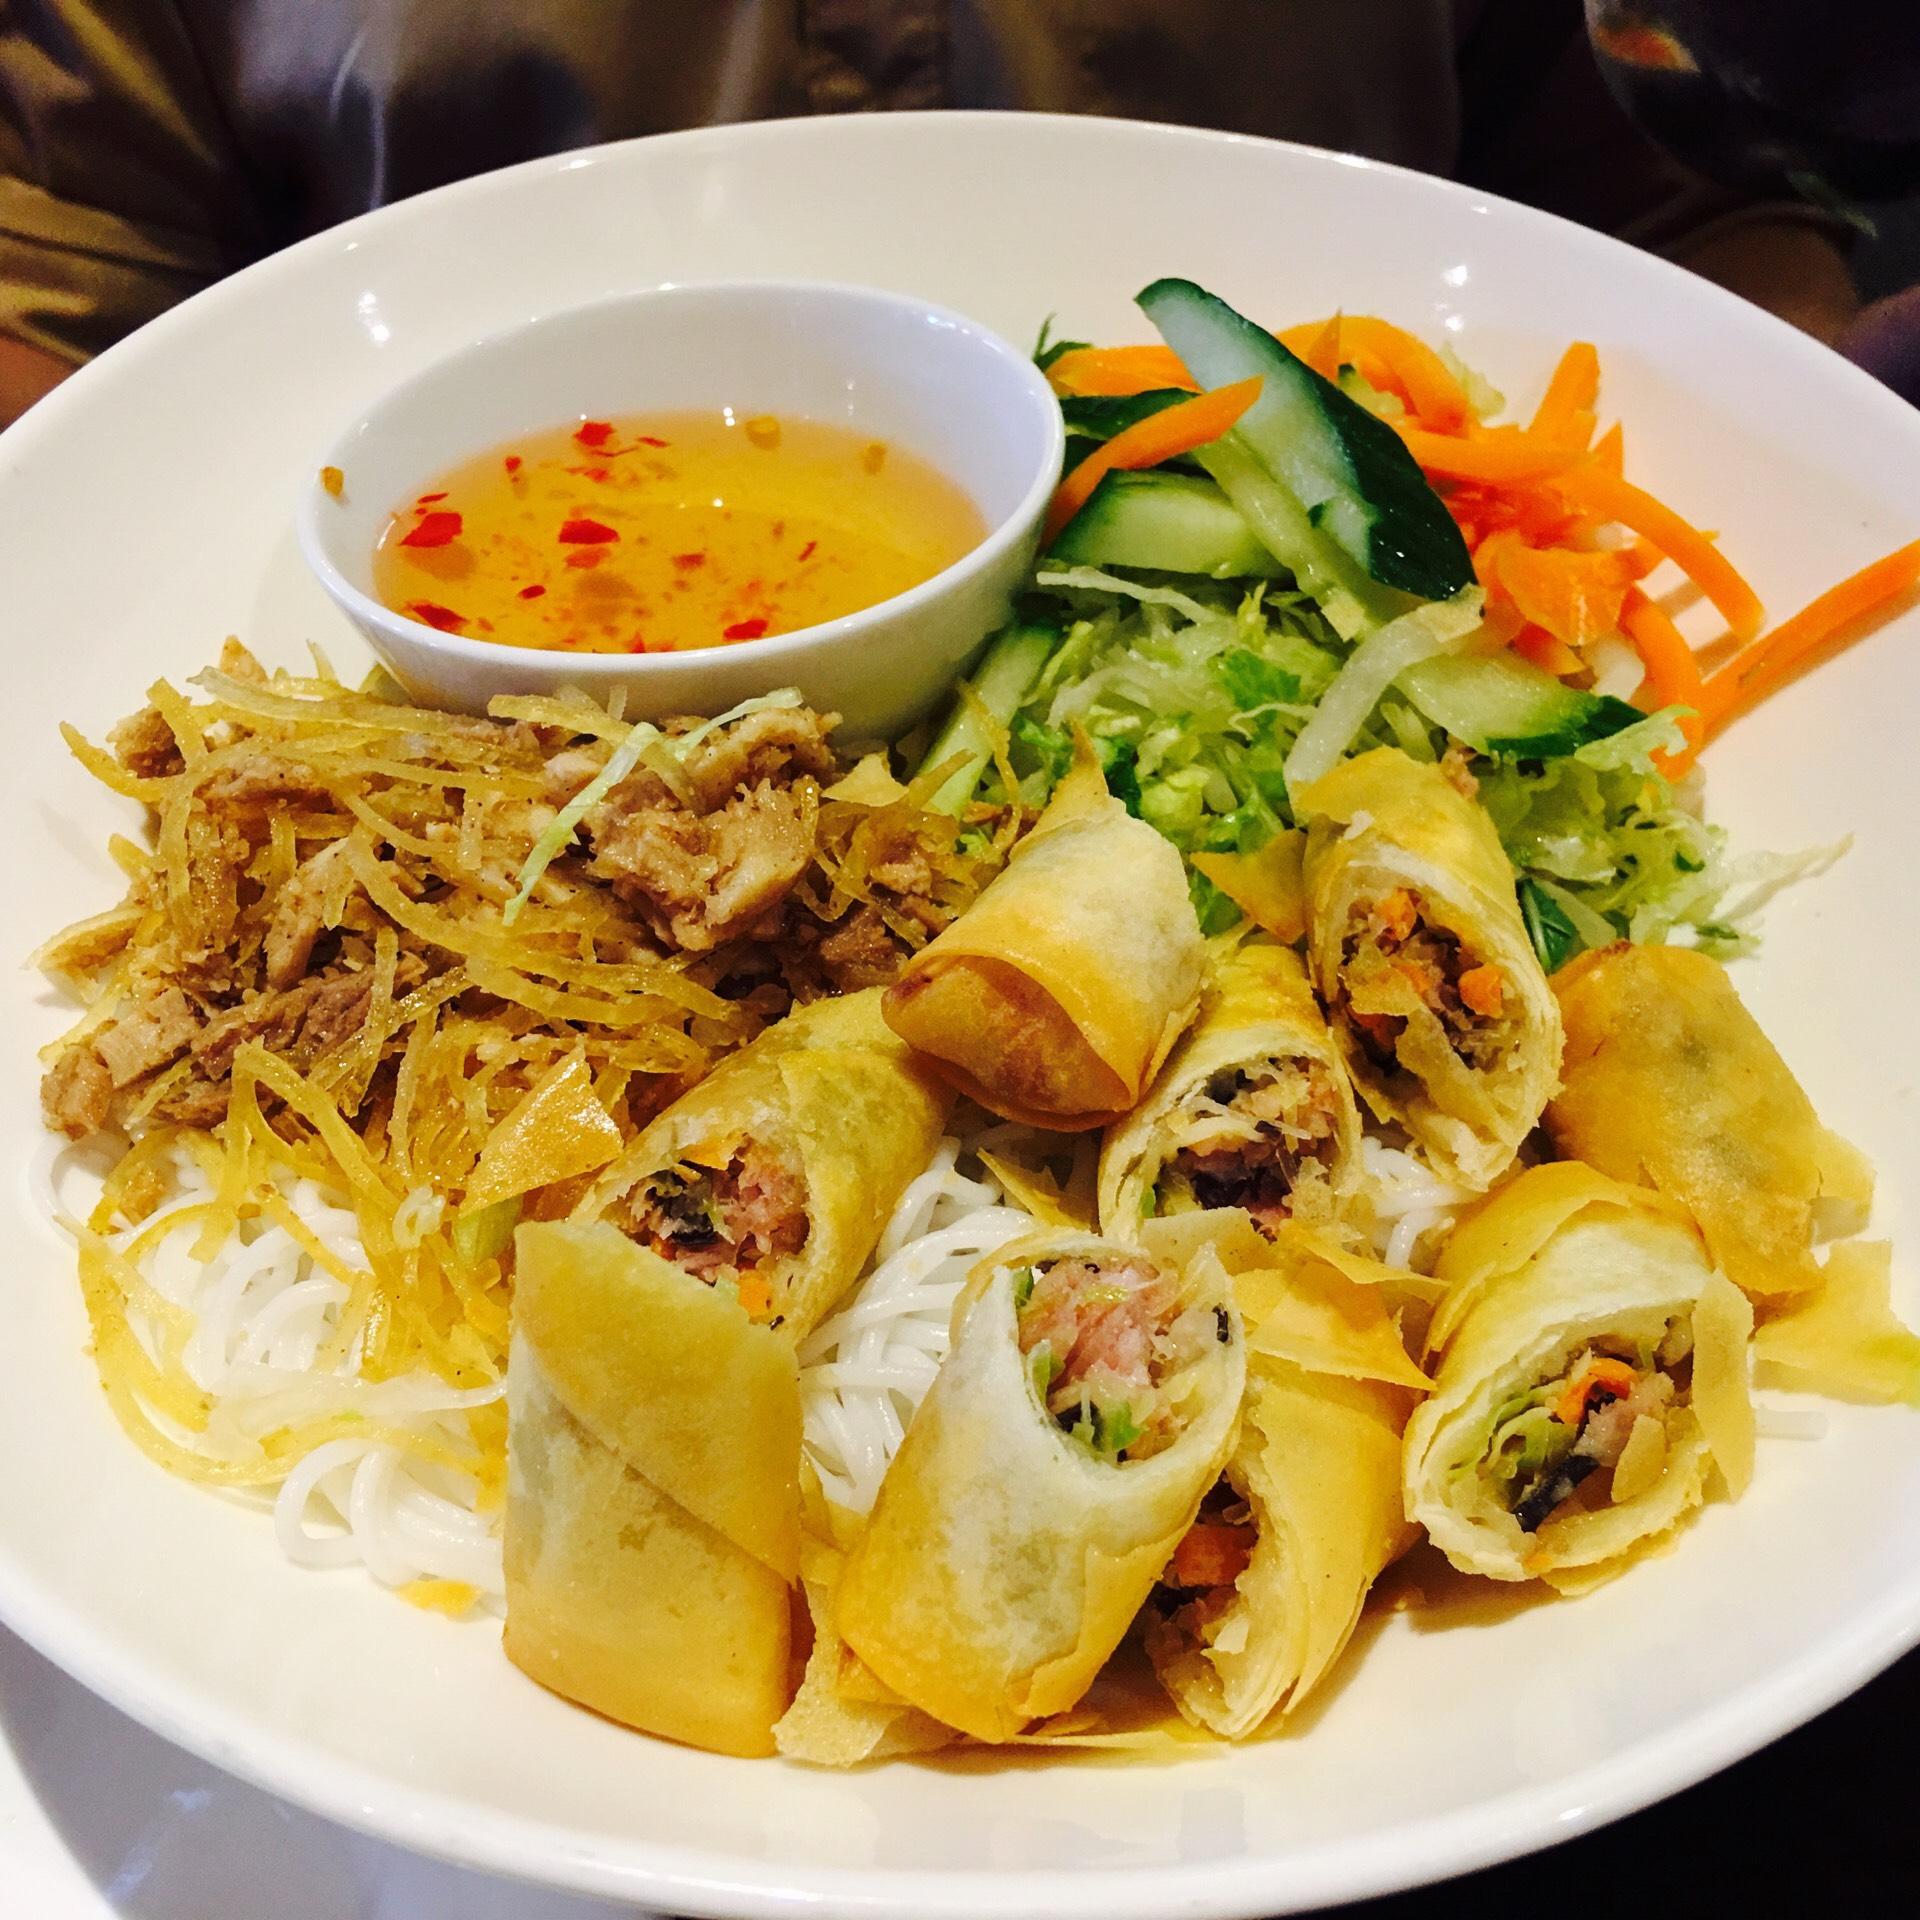 Bun Bi Cha Gio / Vietnamese Rice Noodle Salad with Shredded Pork from Pearl Restaurant